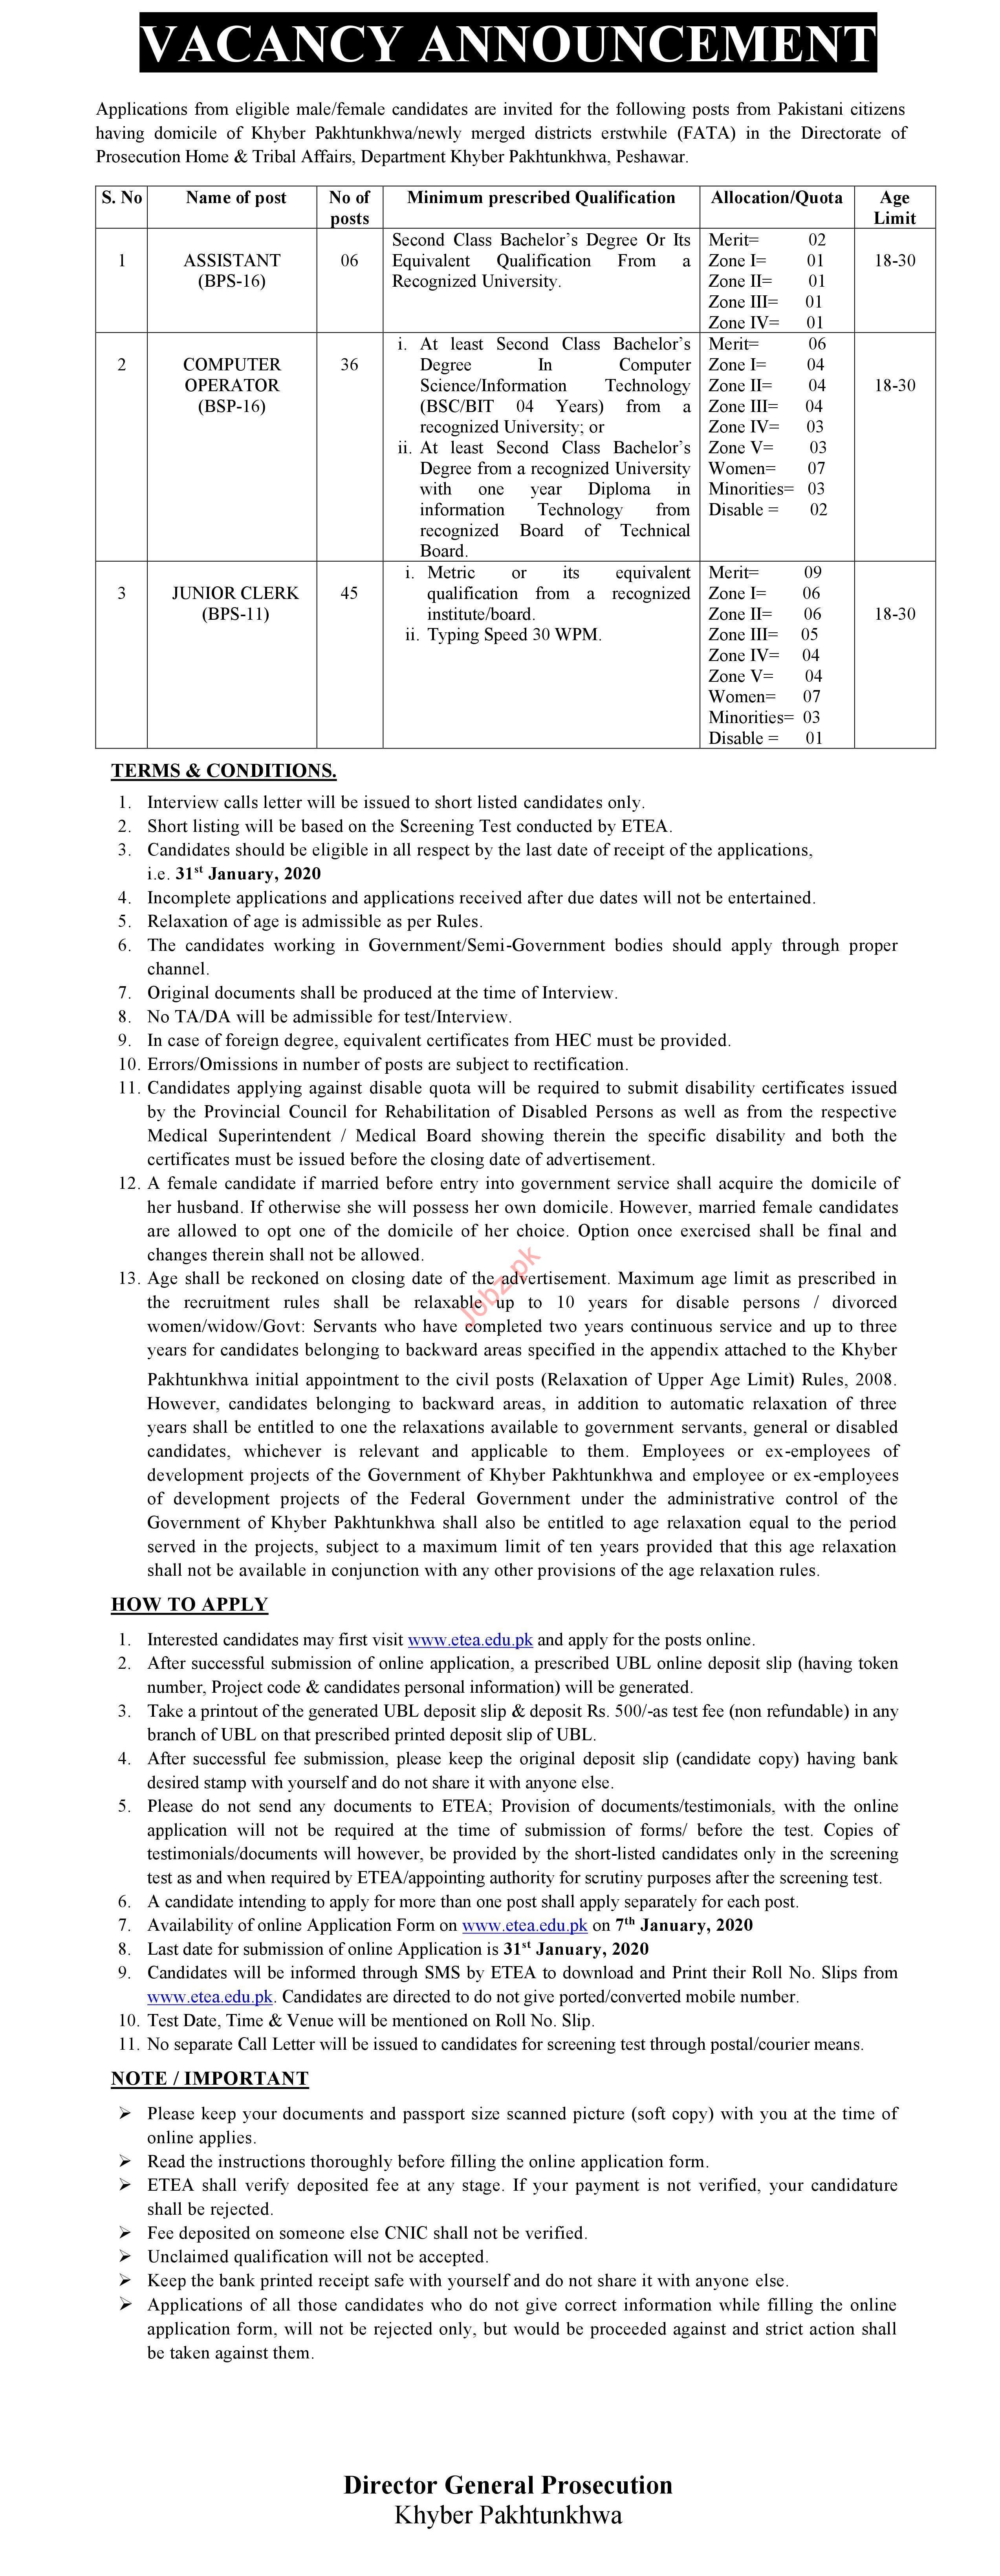 Prosecution Home & Tribal Affairs Jobs 2020 via ETEA